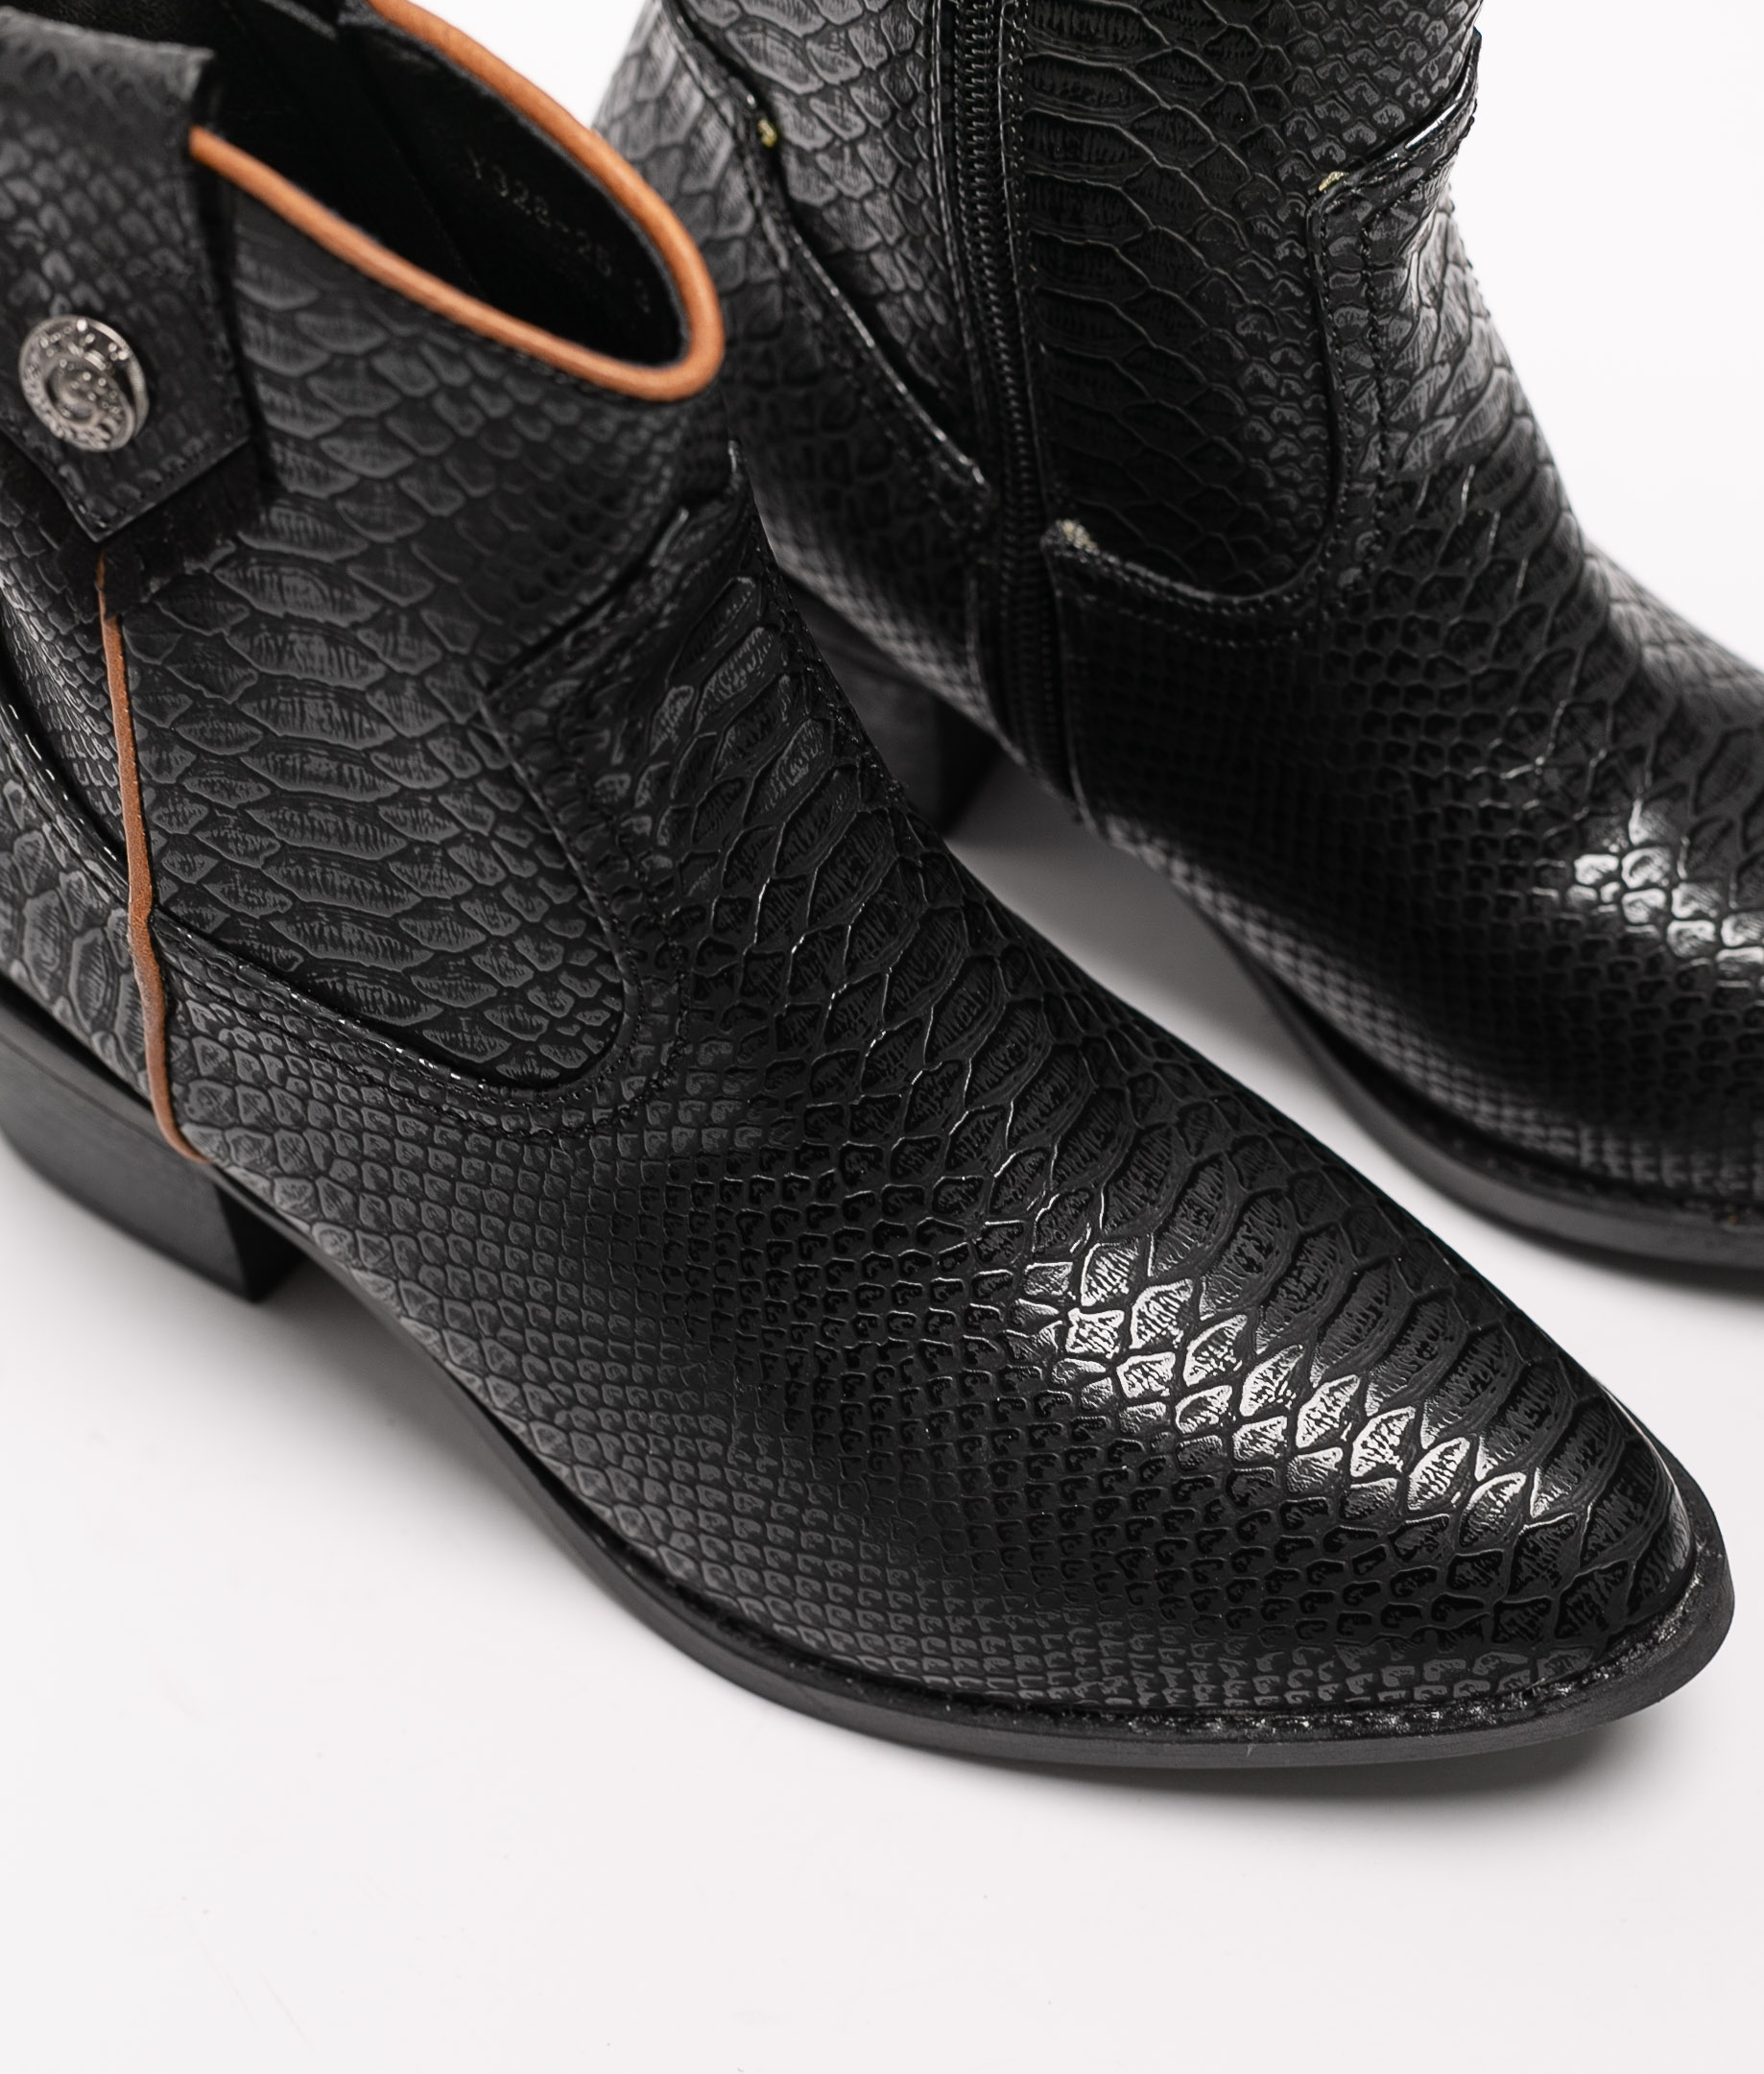 Munch Low Boot - Black